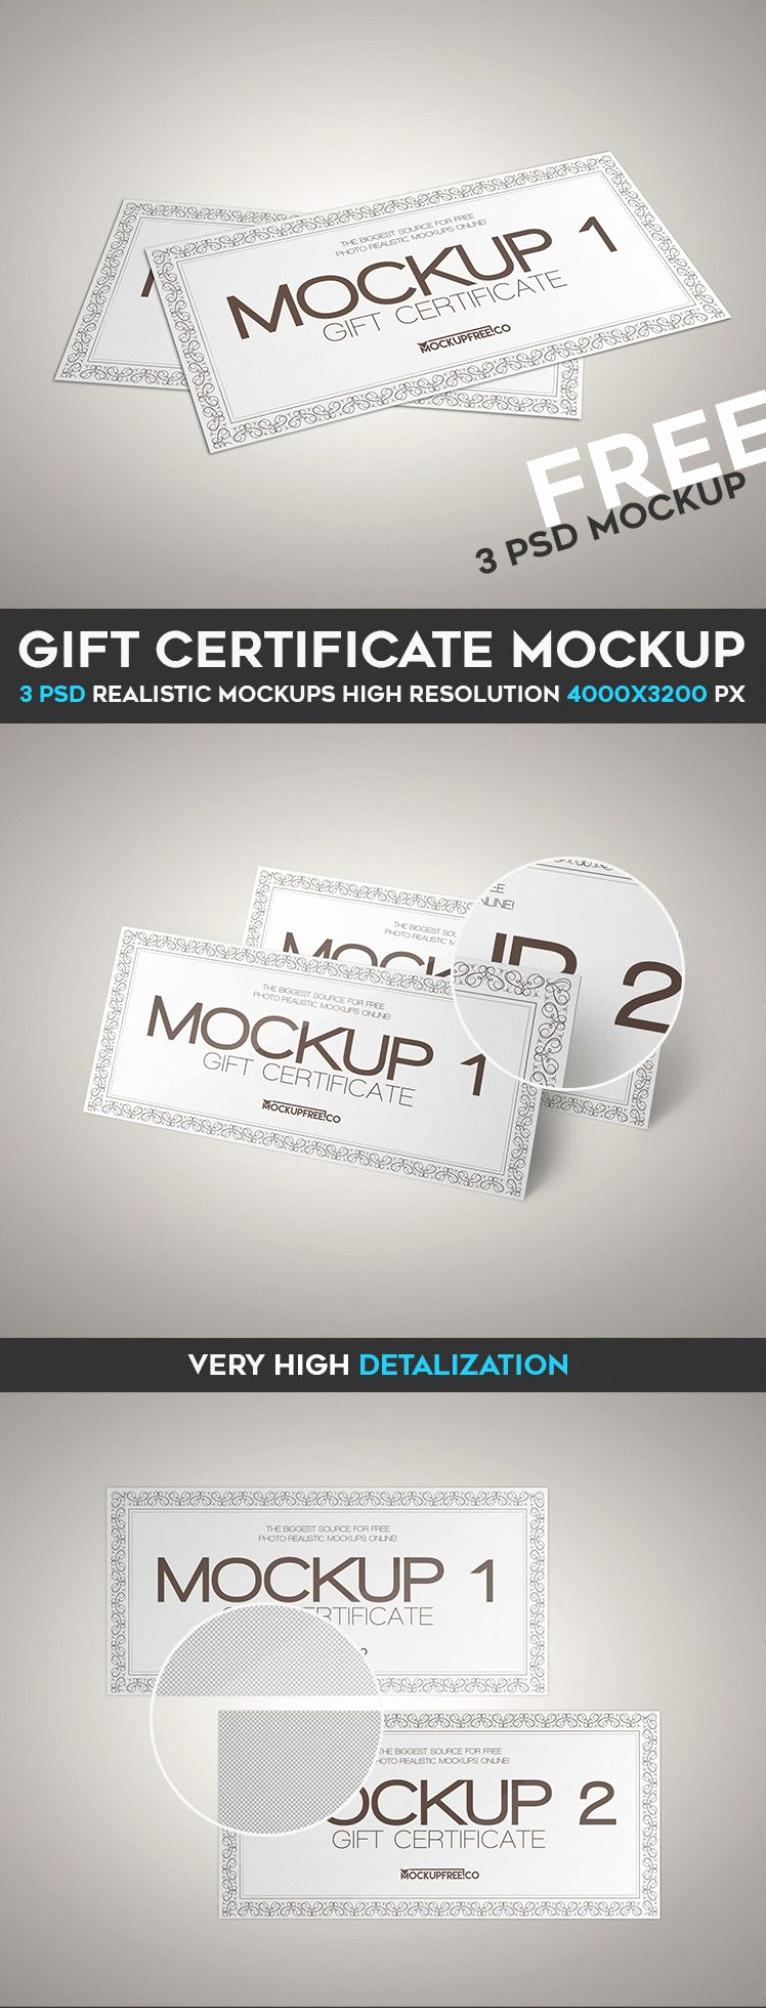 Gift Certificate Psd Mockup Templates Wooskins